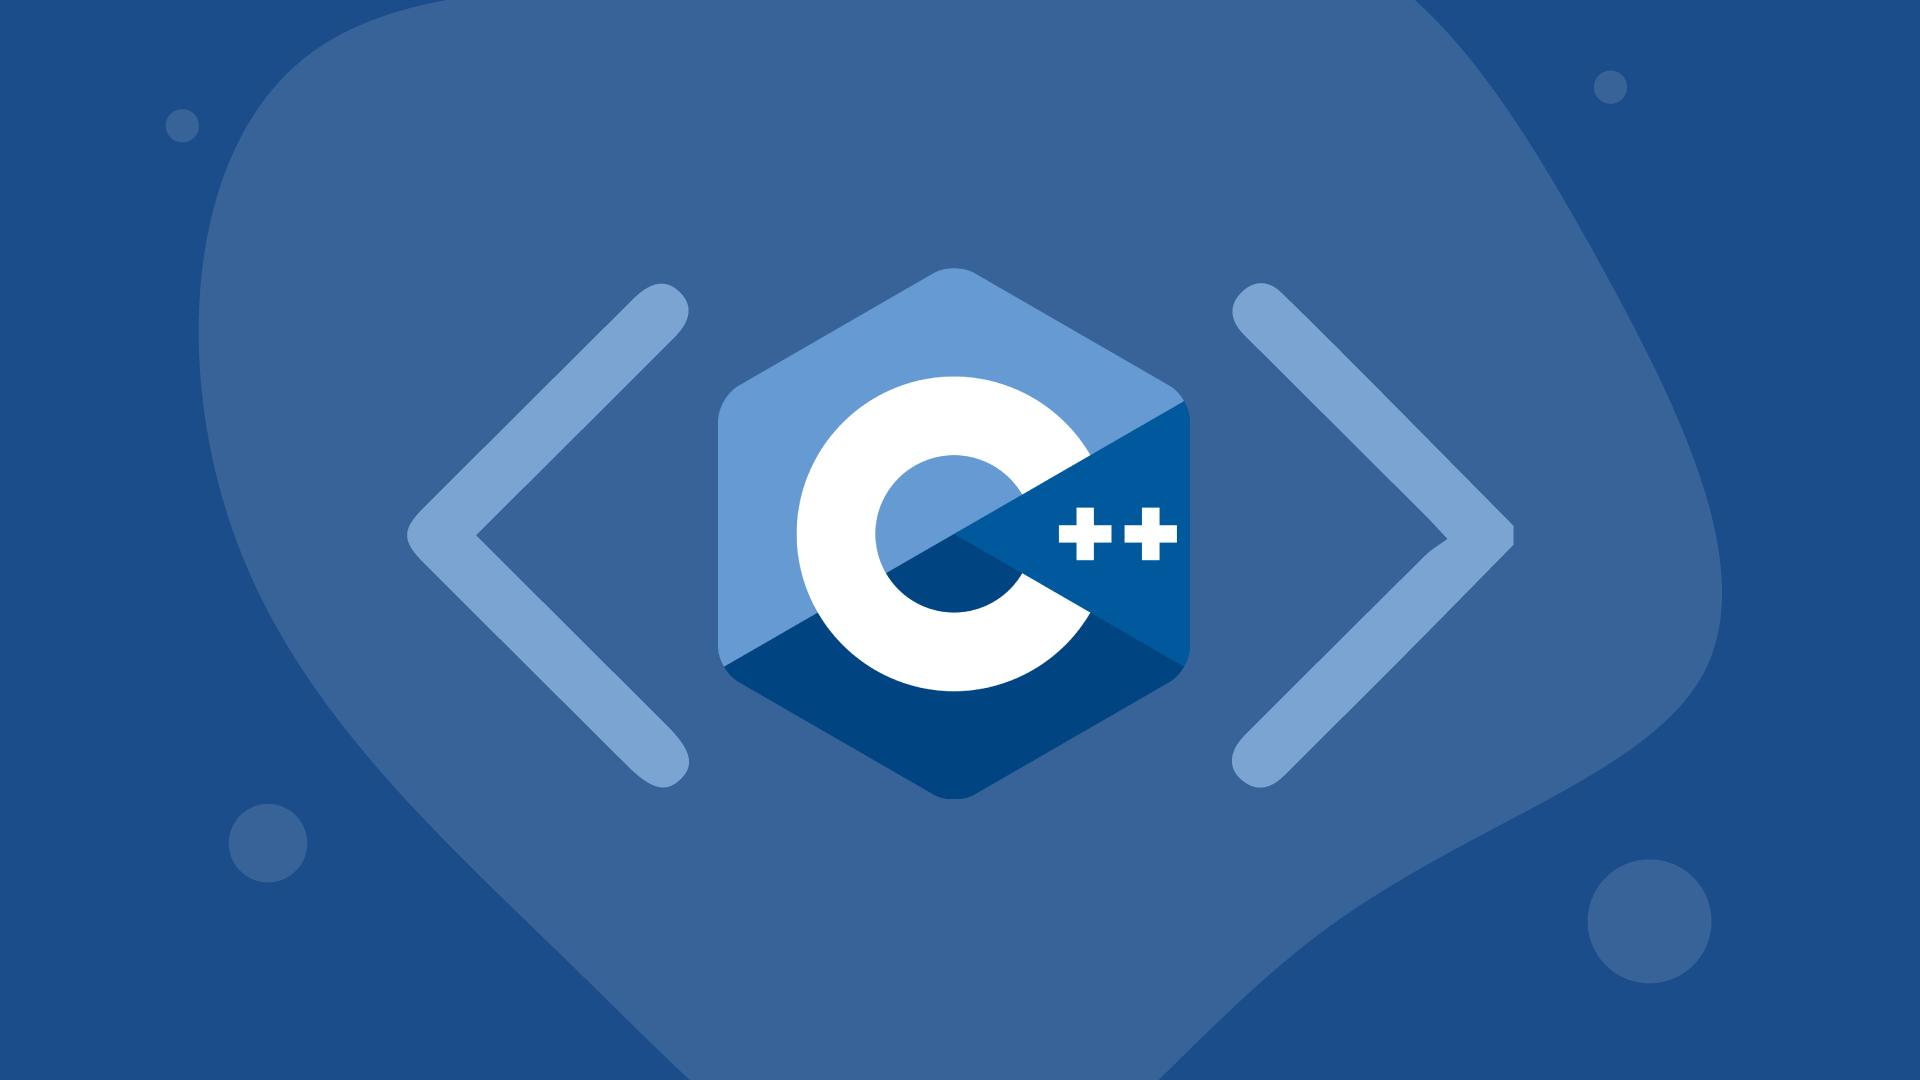 زبان برنامهنویسی سیپلاسپلاس